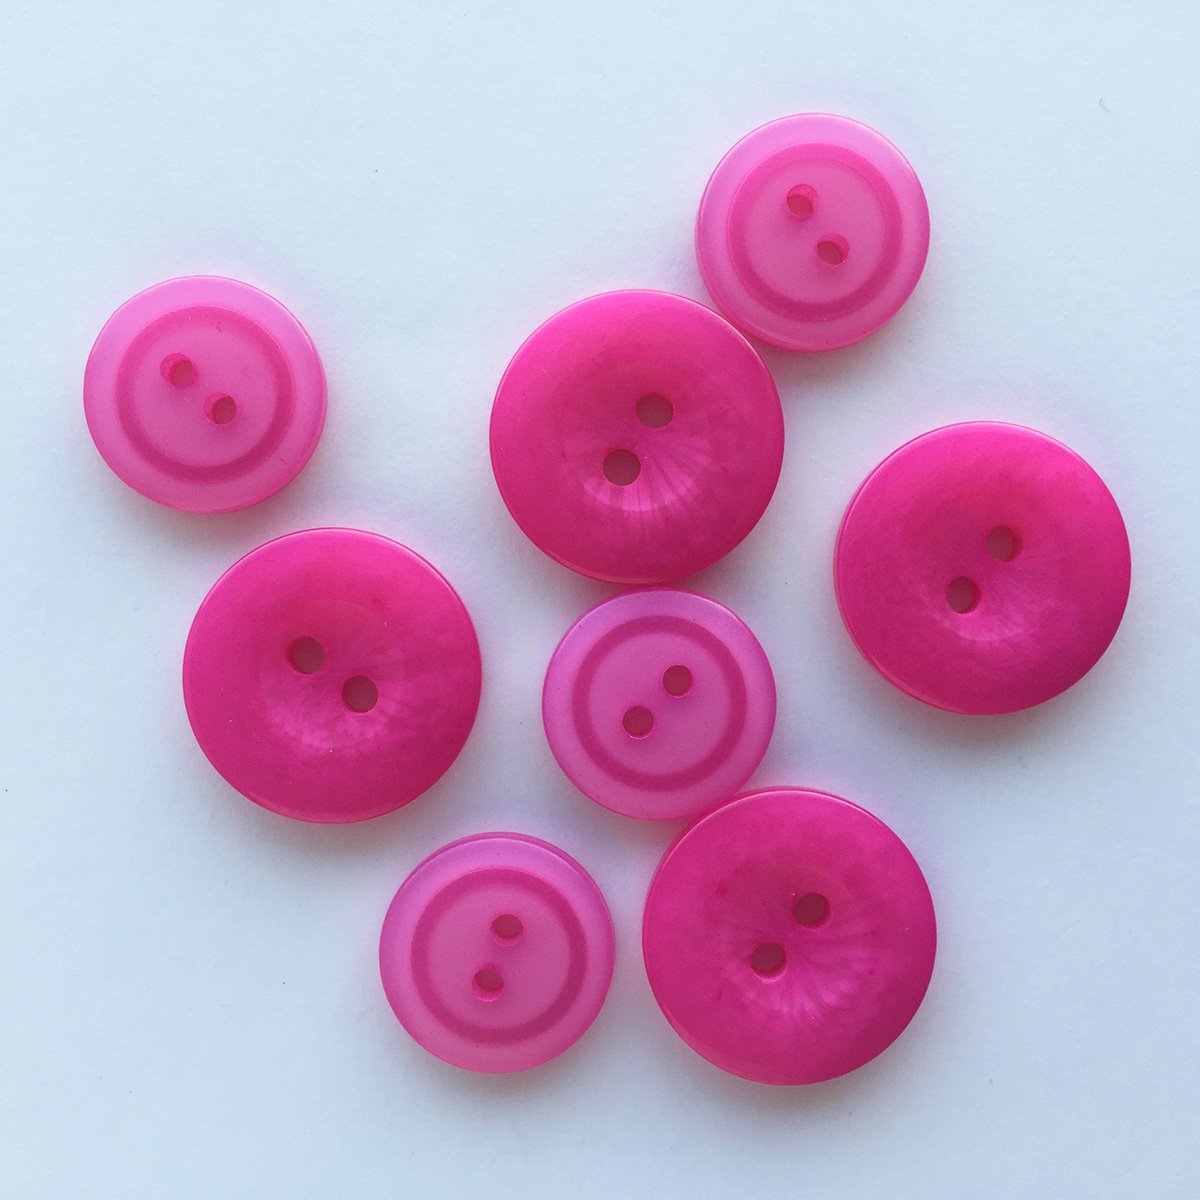 Button Up! Bubblegum